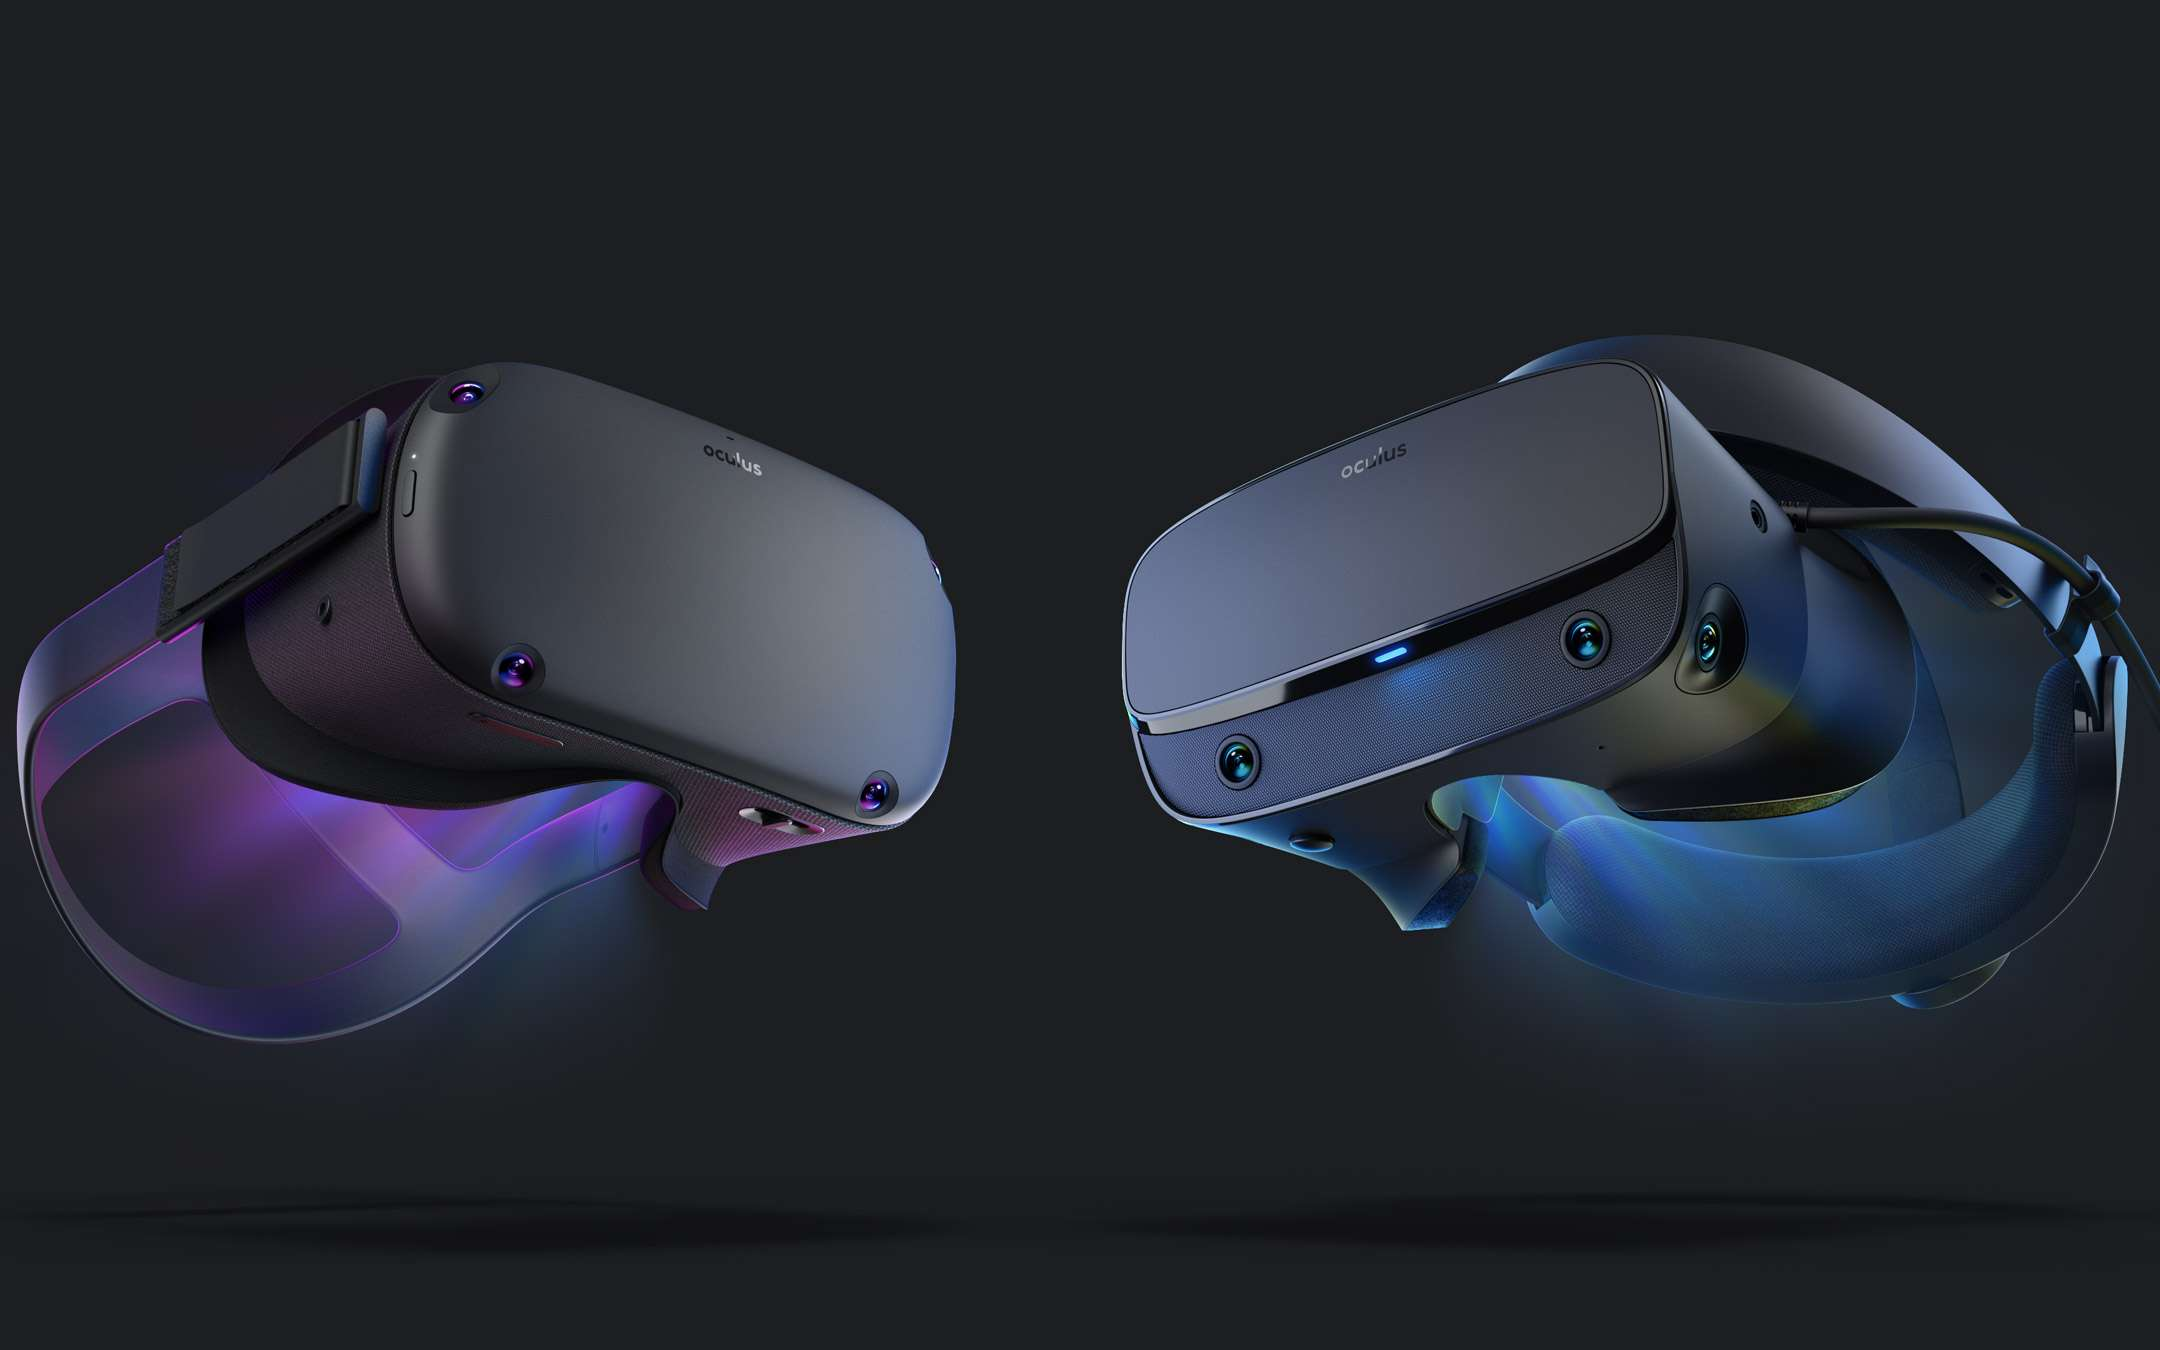 Oculus Quest, Oculus Rift S